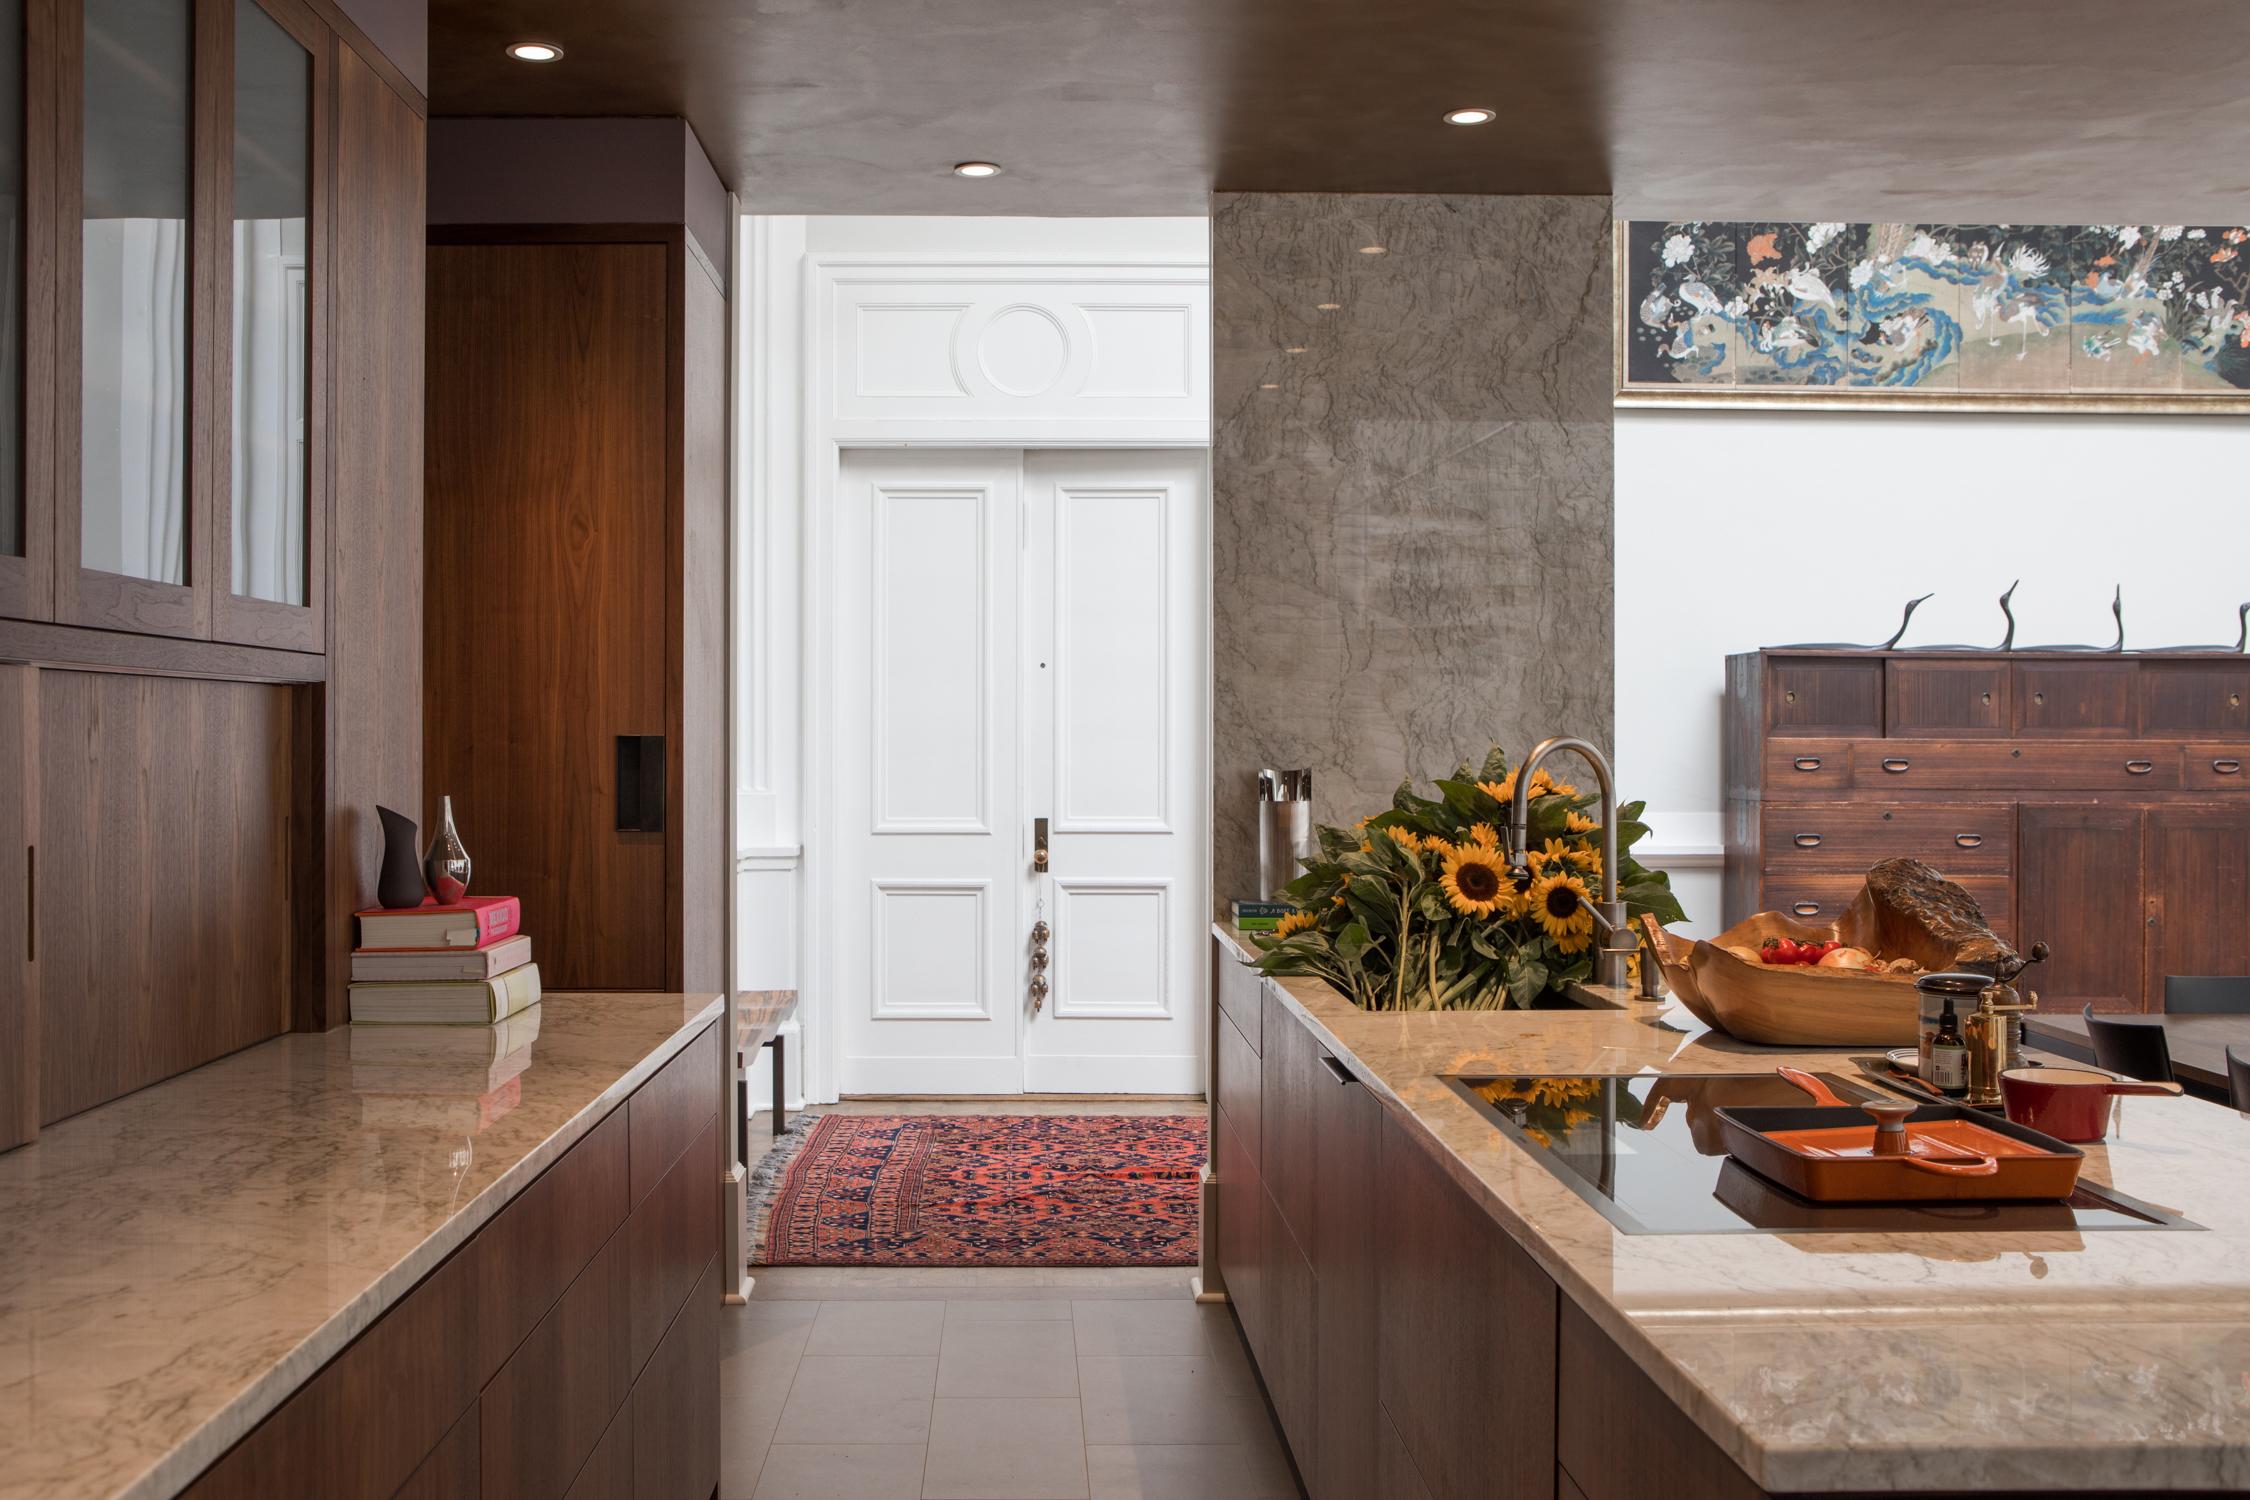 Kitchen West - New Walnut Kitchen Cabinets , Quartzite Tops and Sidewal